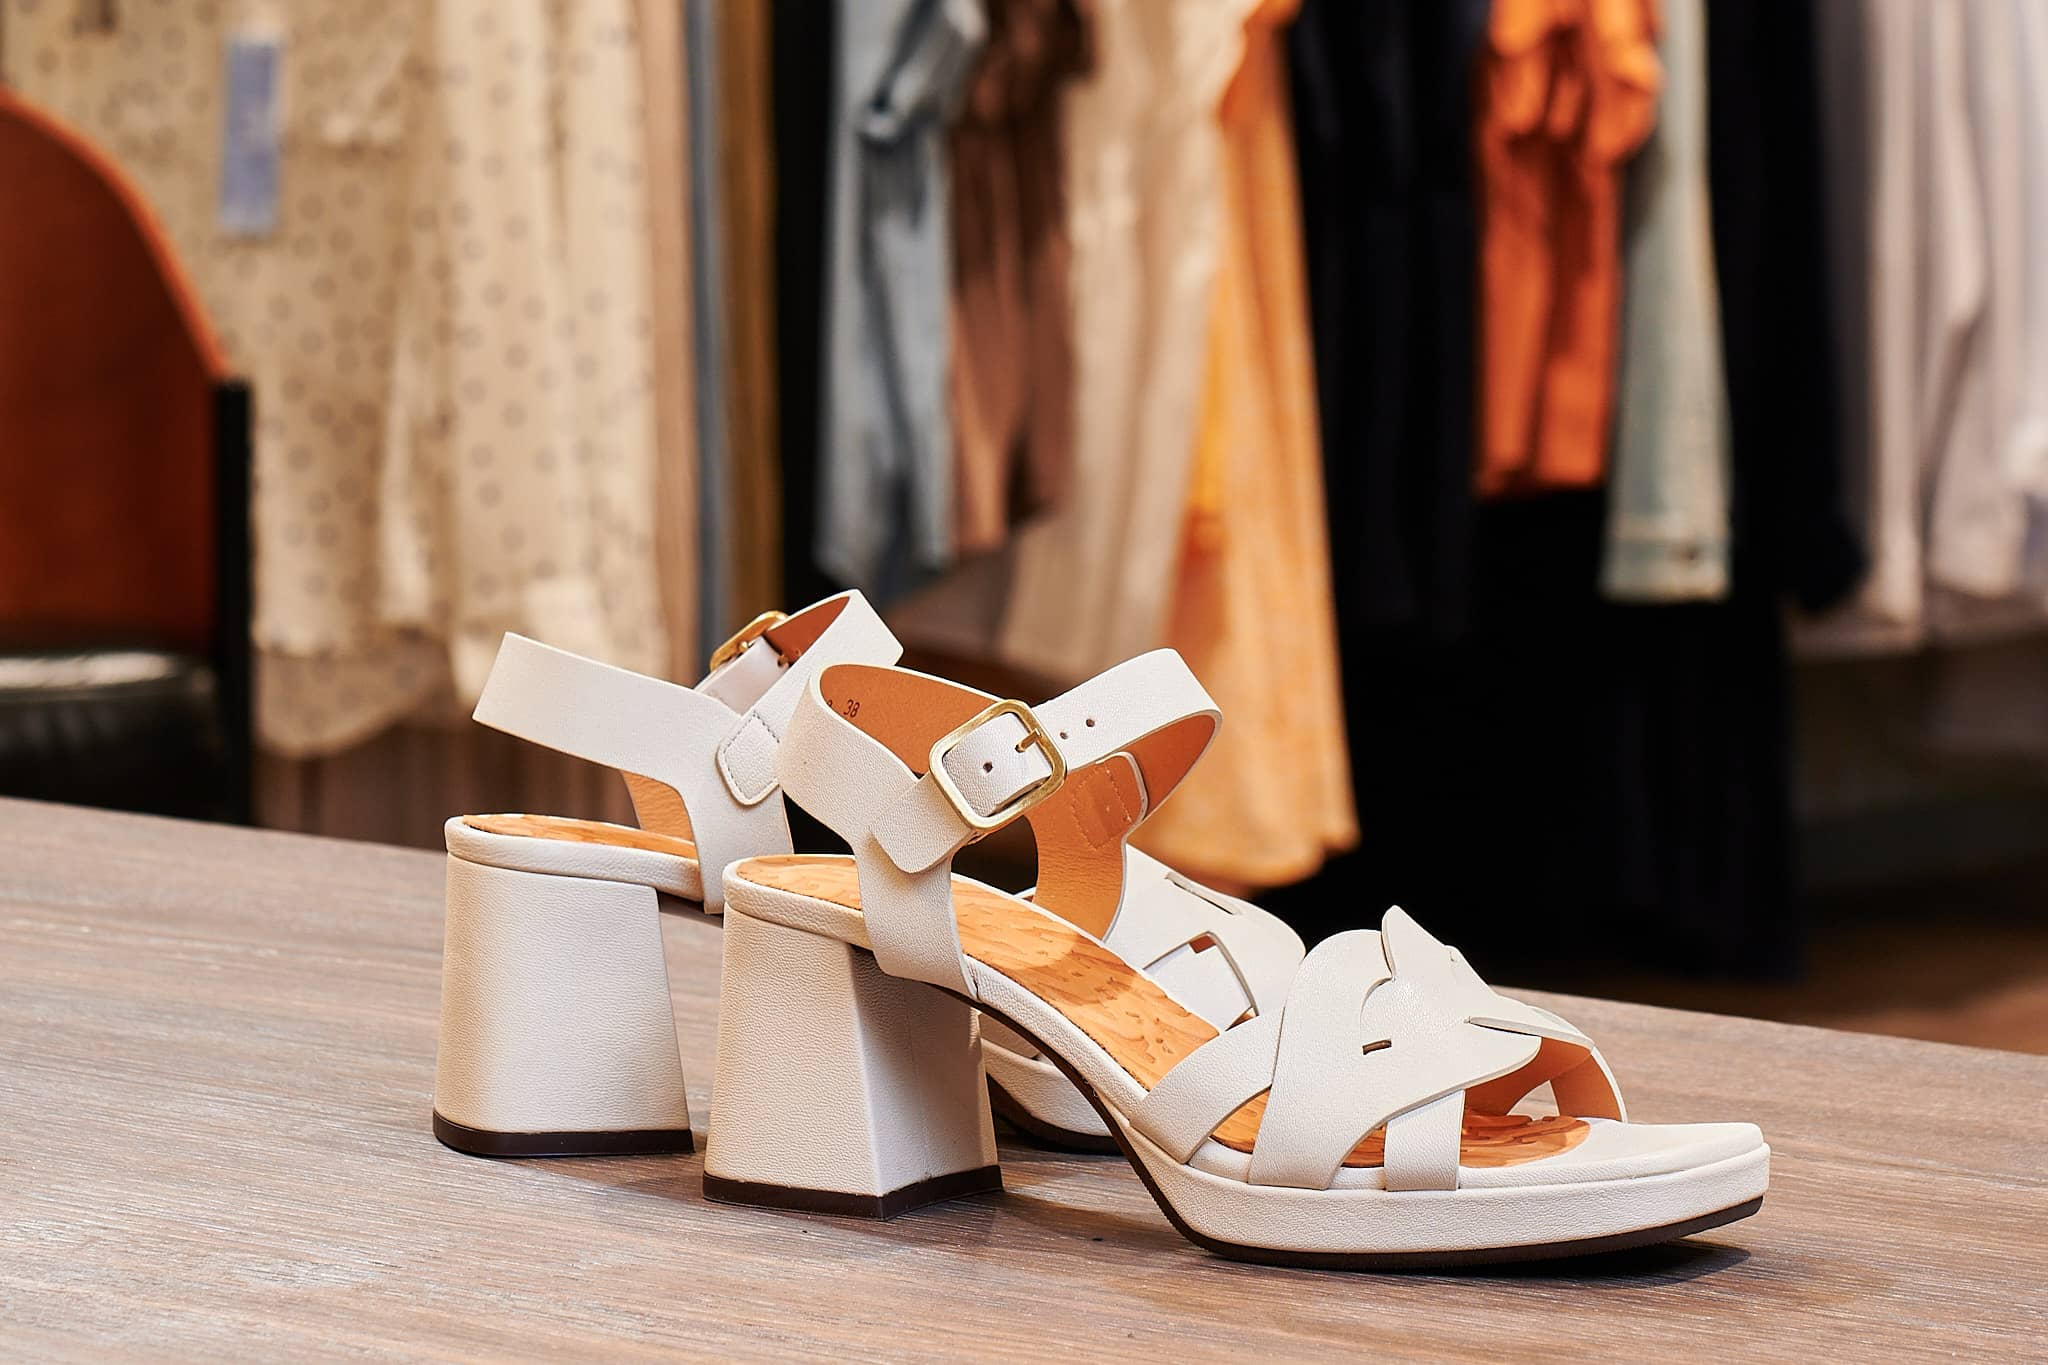 Chie Mihara Sandalette Creme